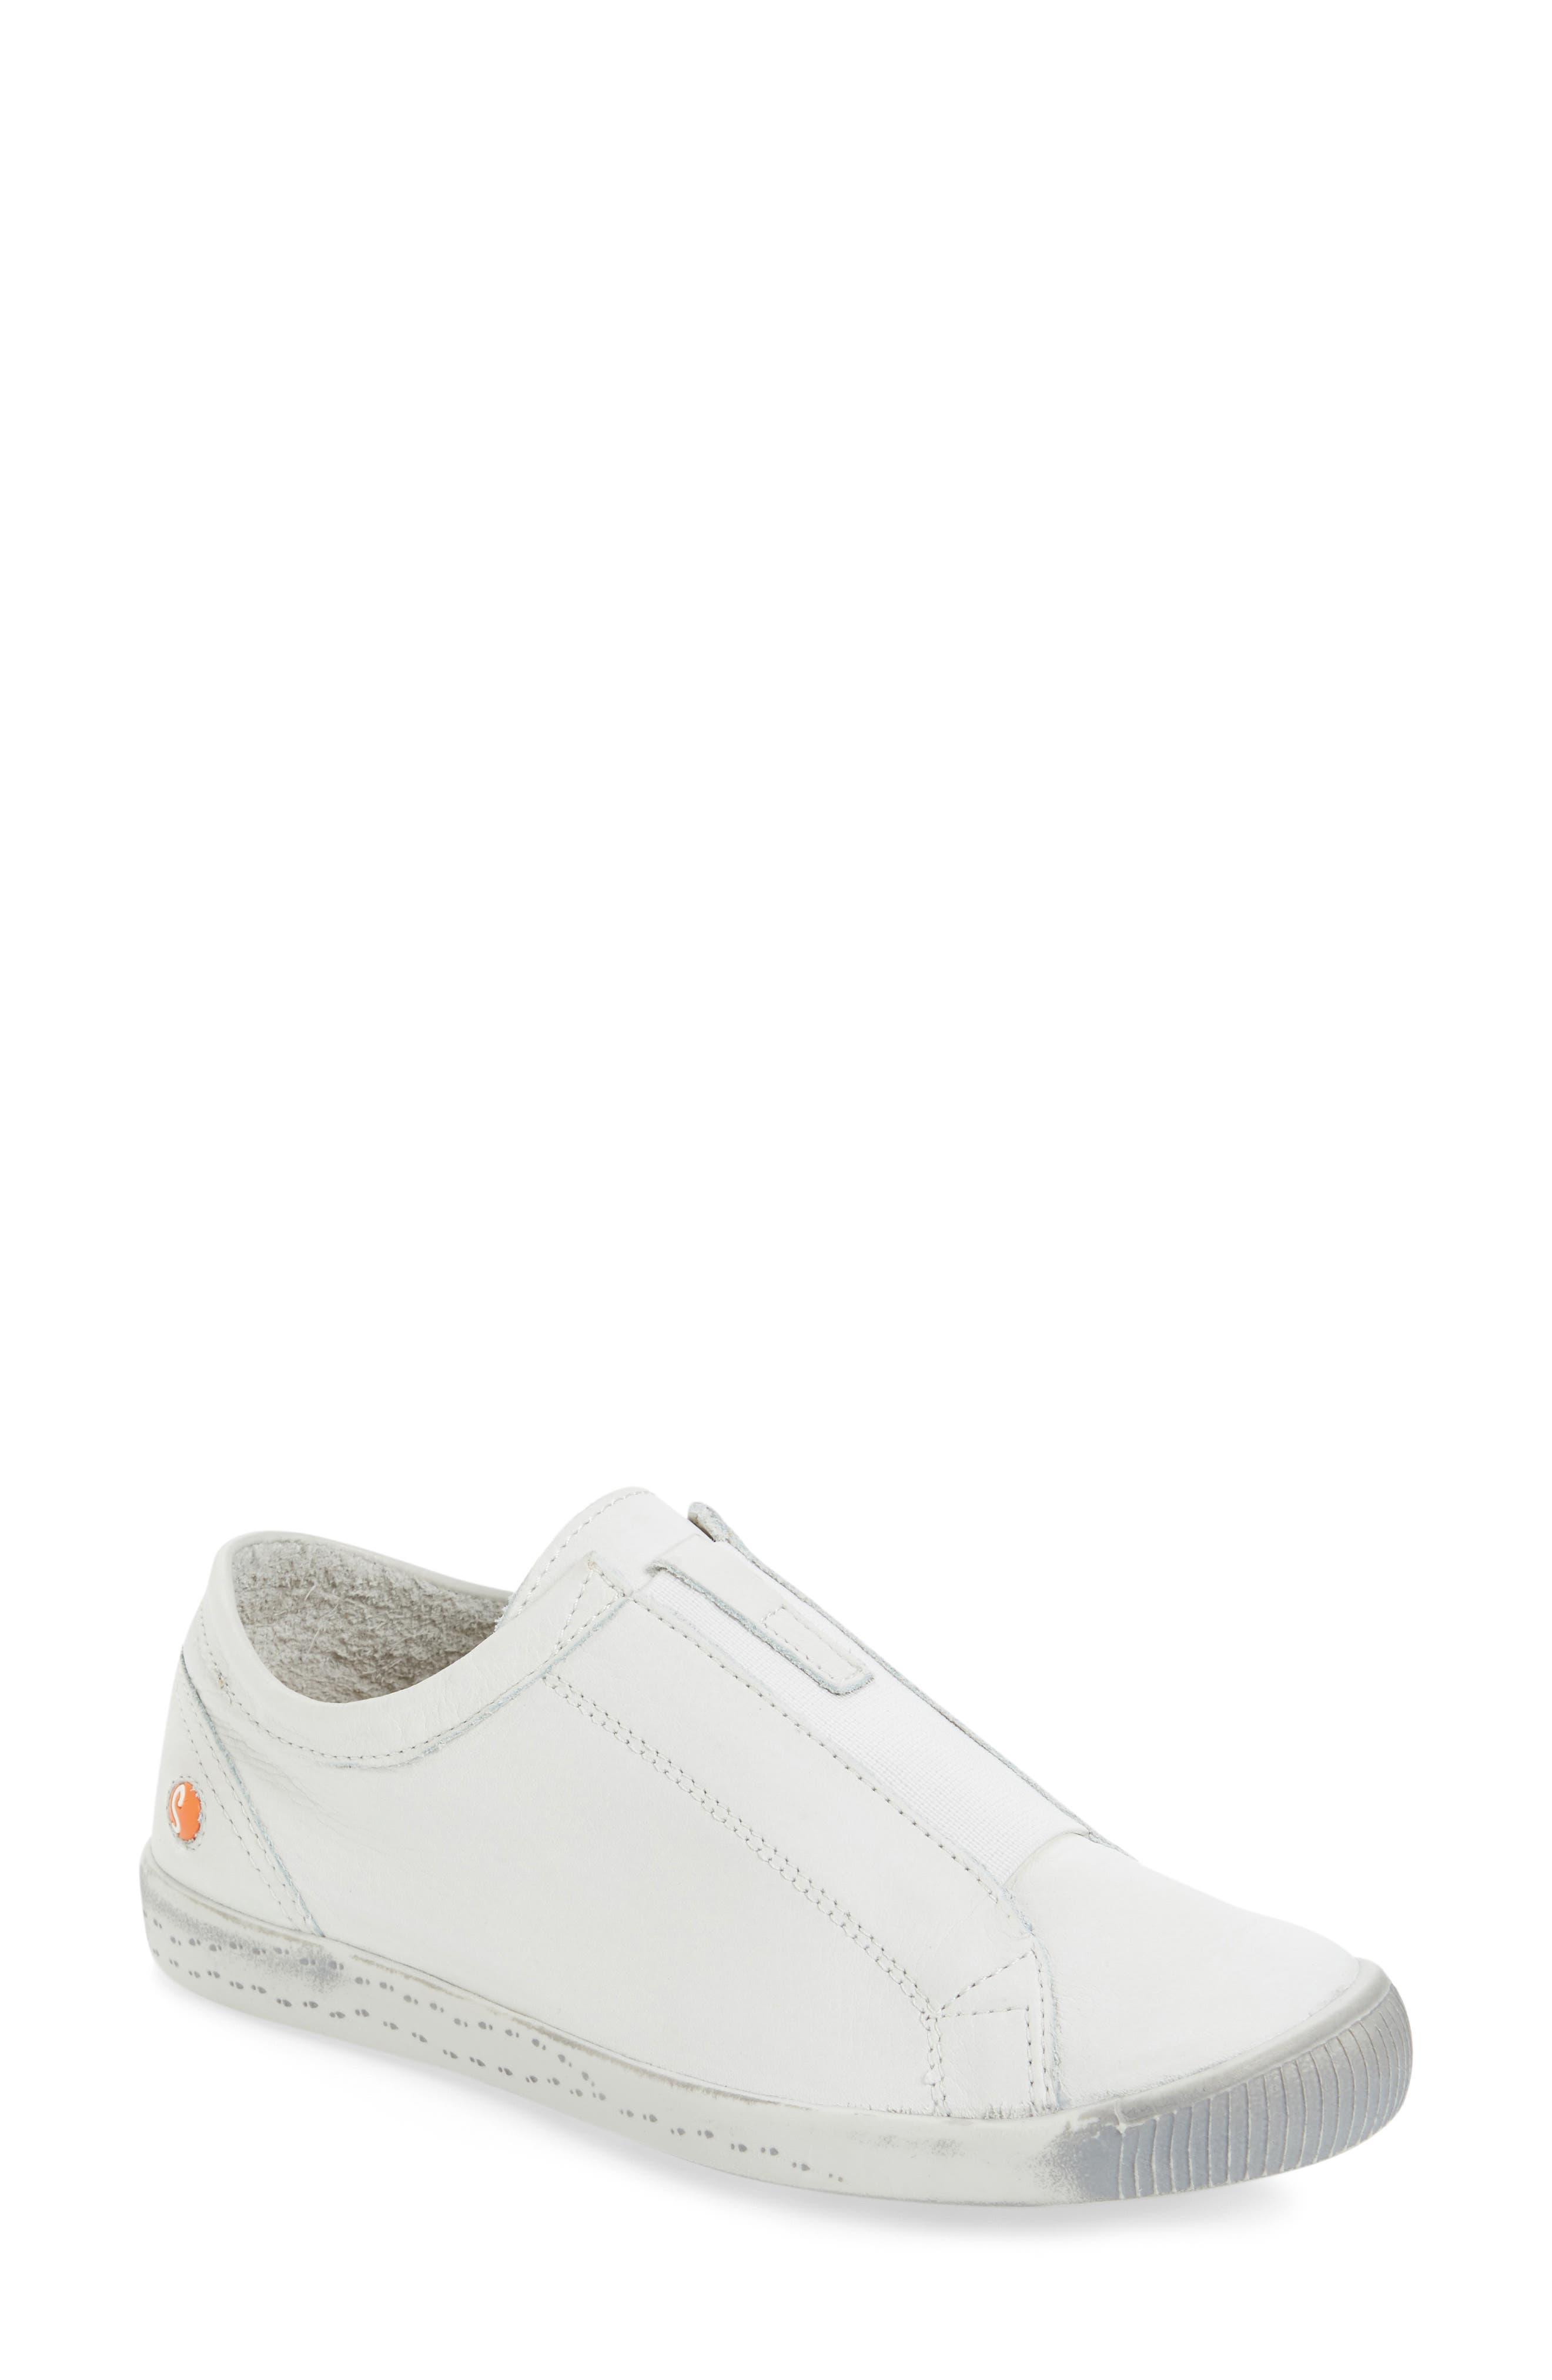 Alternate Image 1 Selected - Fly London Ilo Slip-On Sneaker (Women)